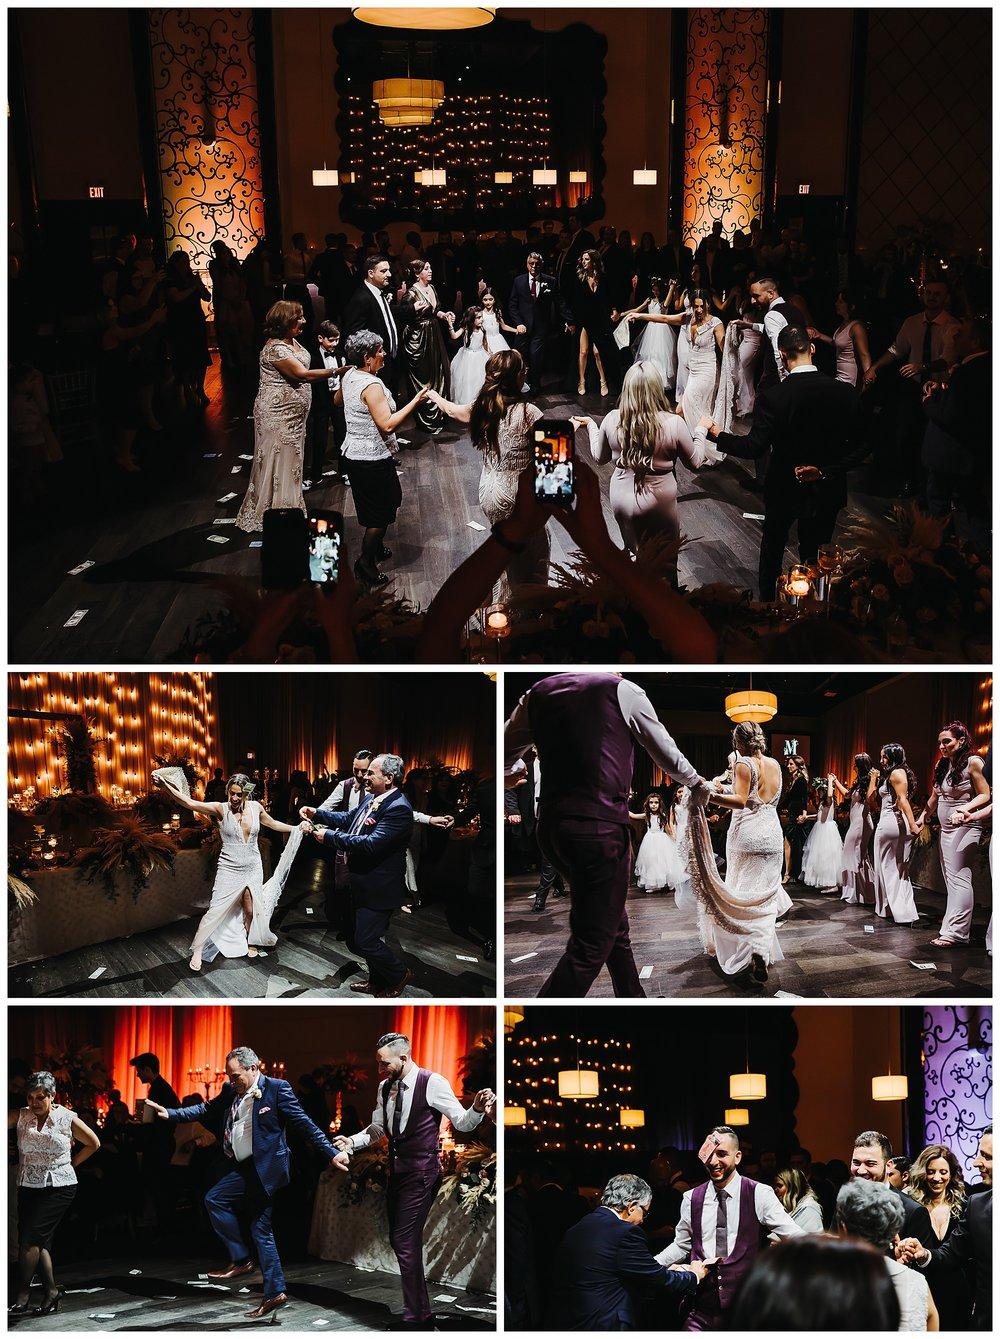 Joanna-Christos-Grand-Luxe-Wedding-Photos-Mint-Room-Toronto-VanDaele-Russell_0104.jpg